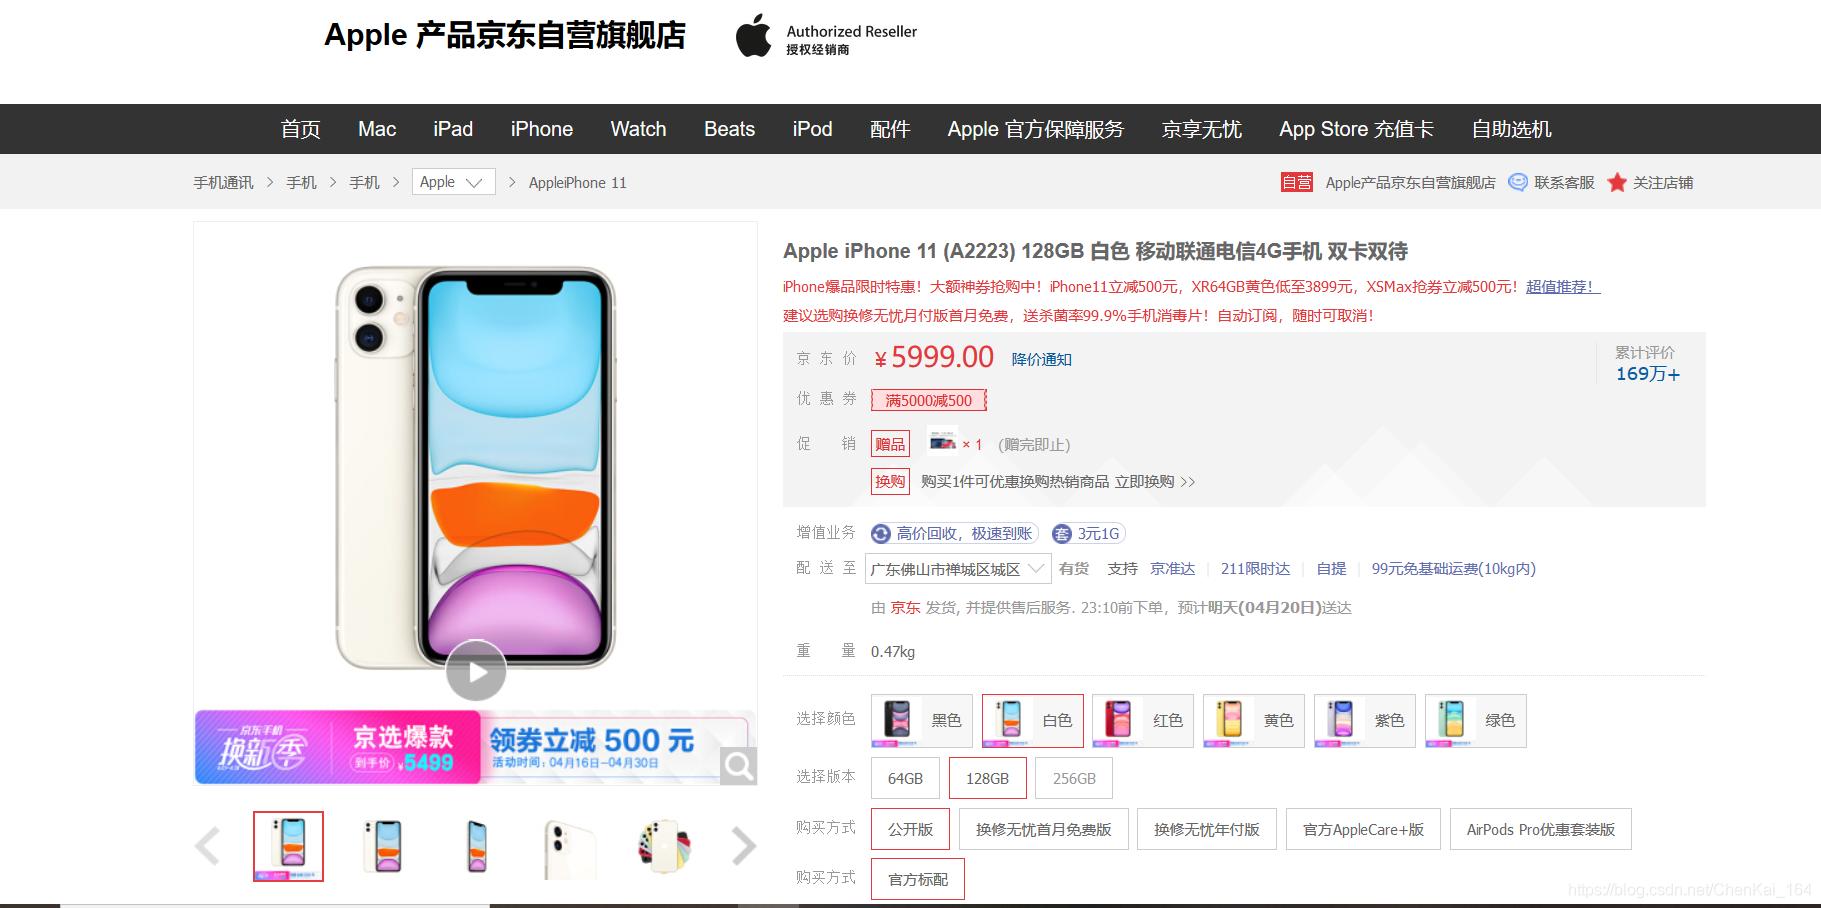 京东商品 Apple iphone 11